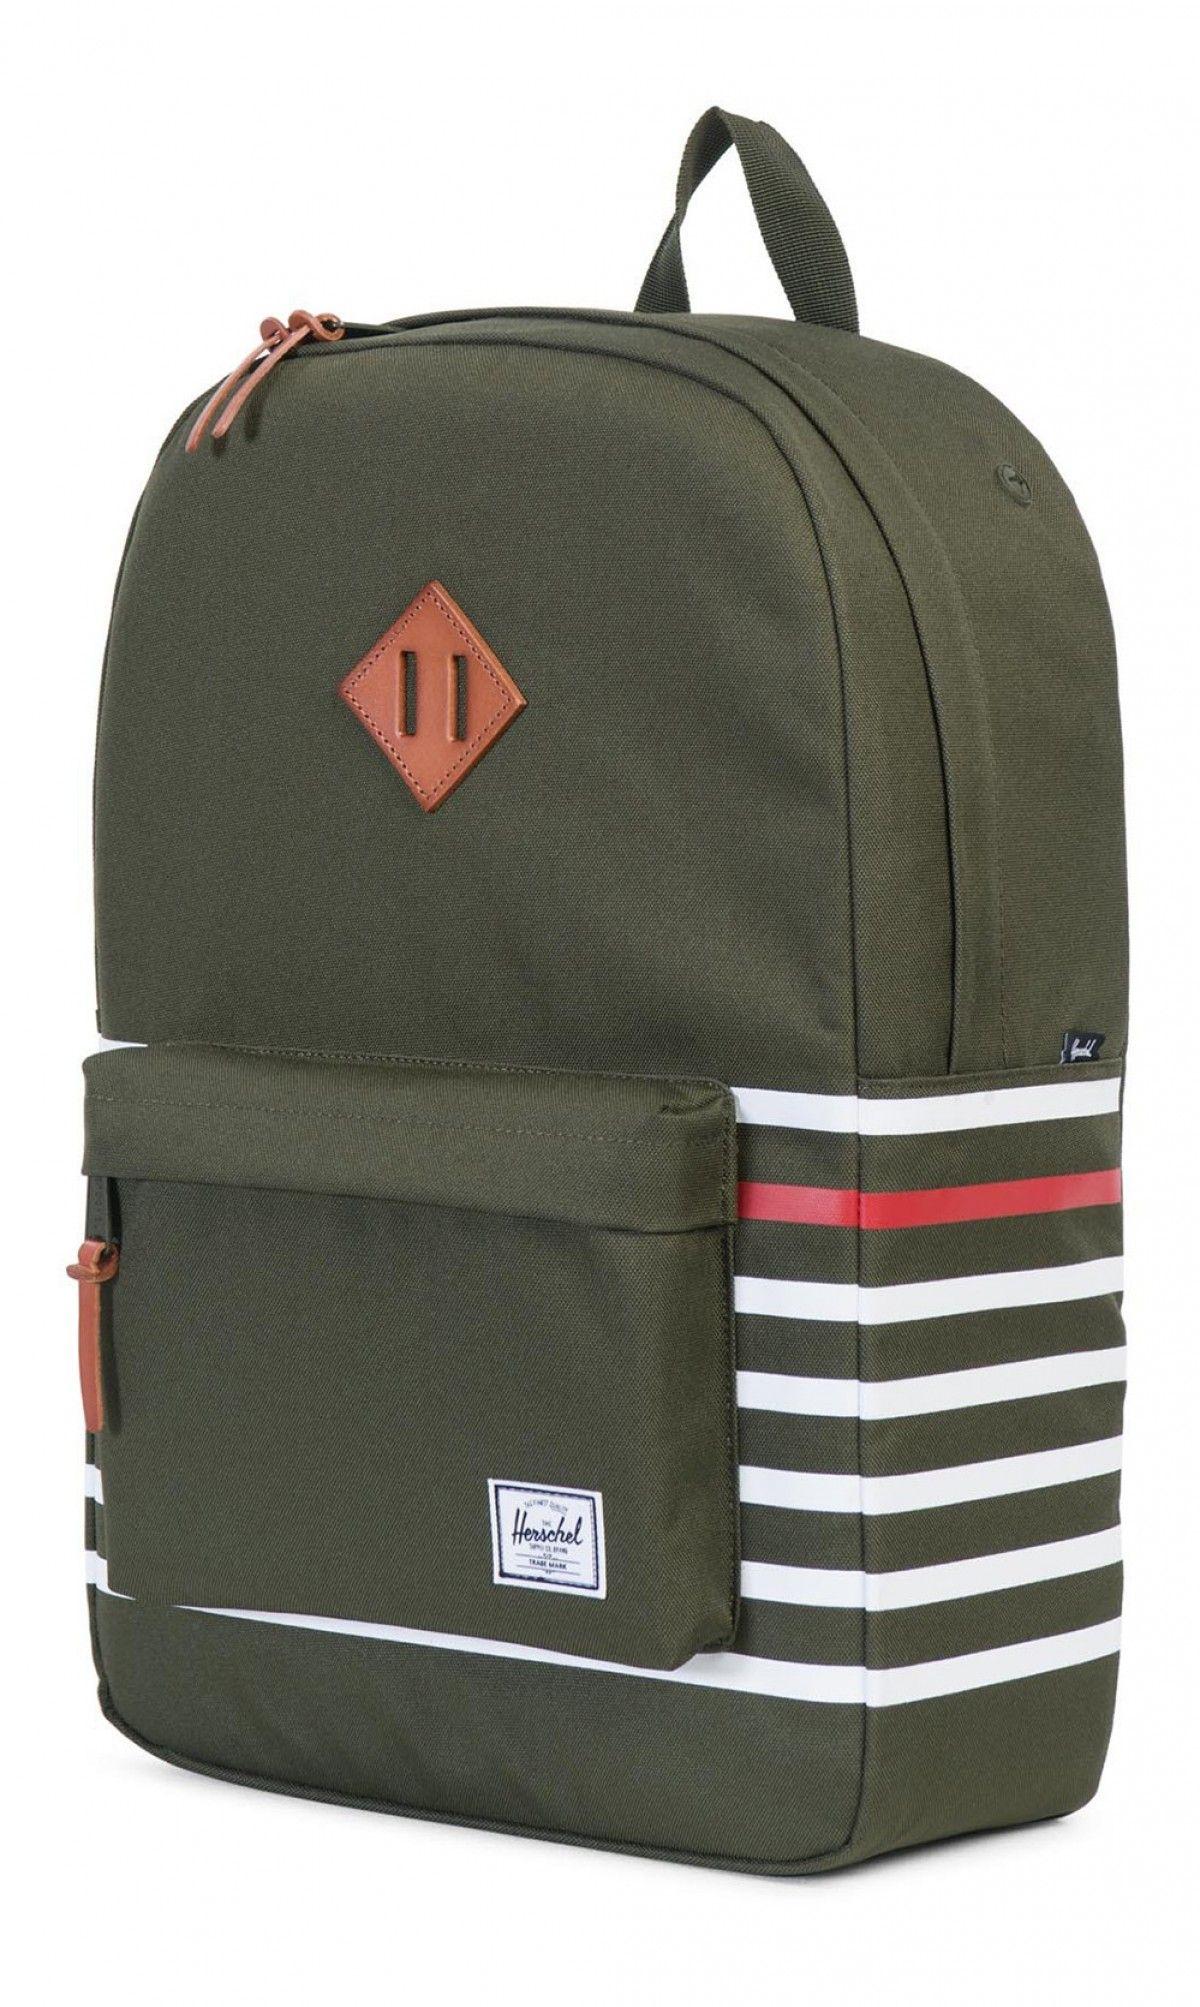 8786383b5035 Herschel Heritage Backpack Poly Offset Forest 10007-01236-OS ...